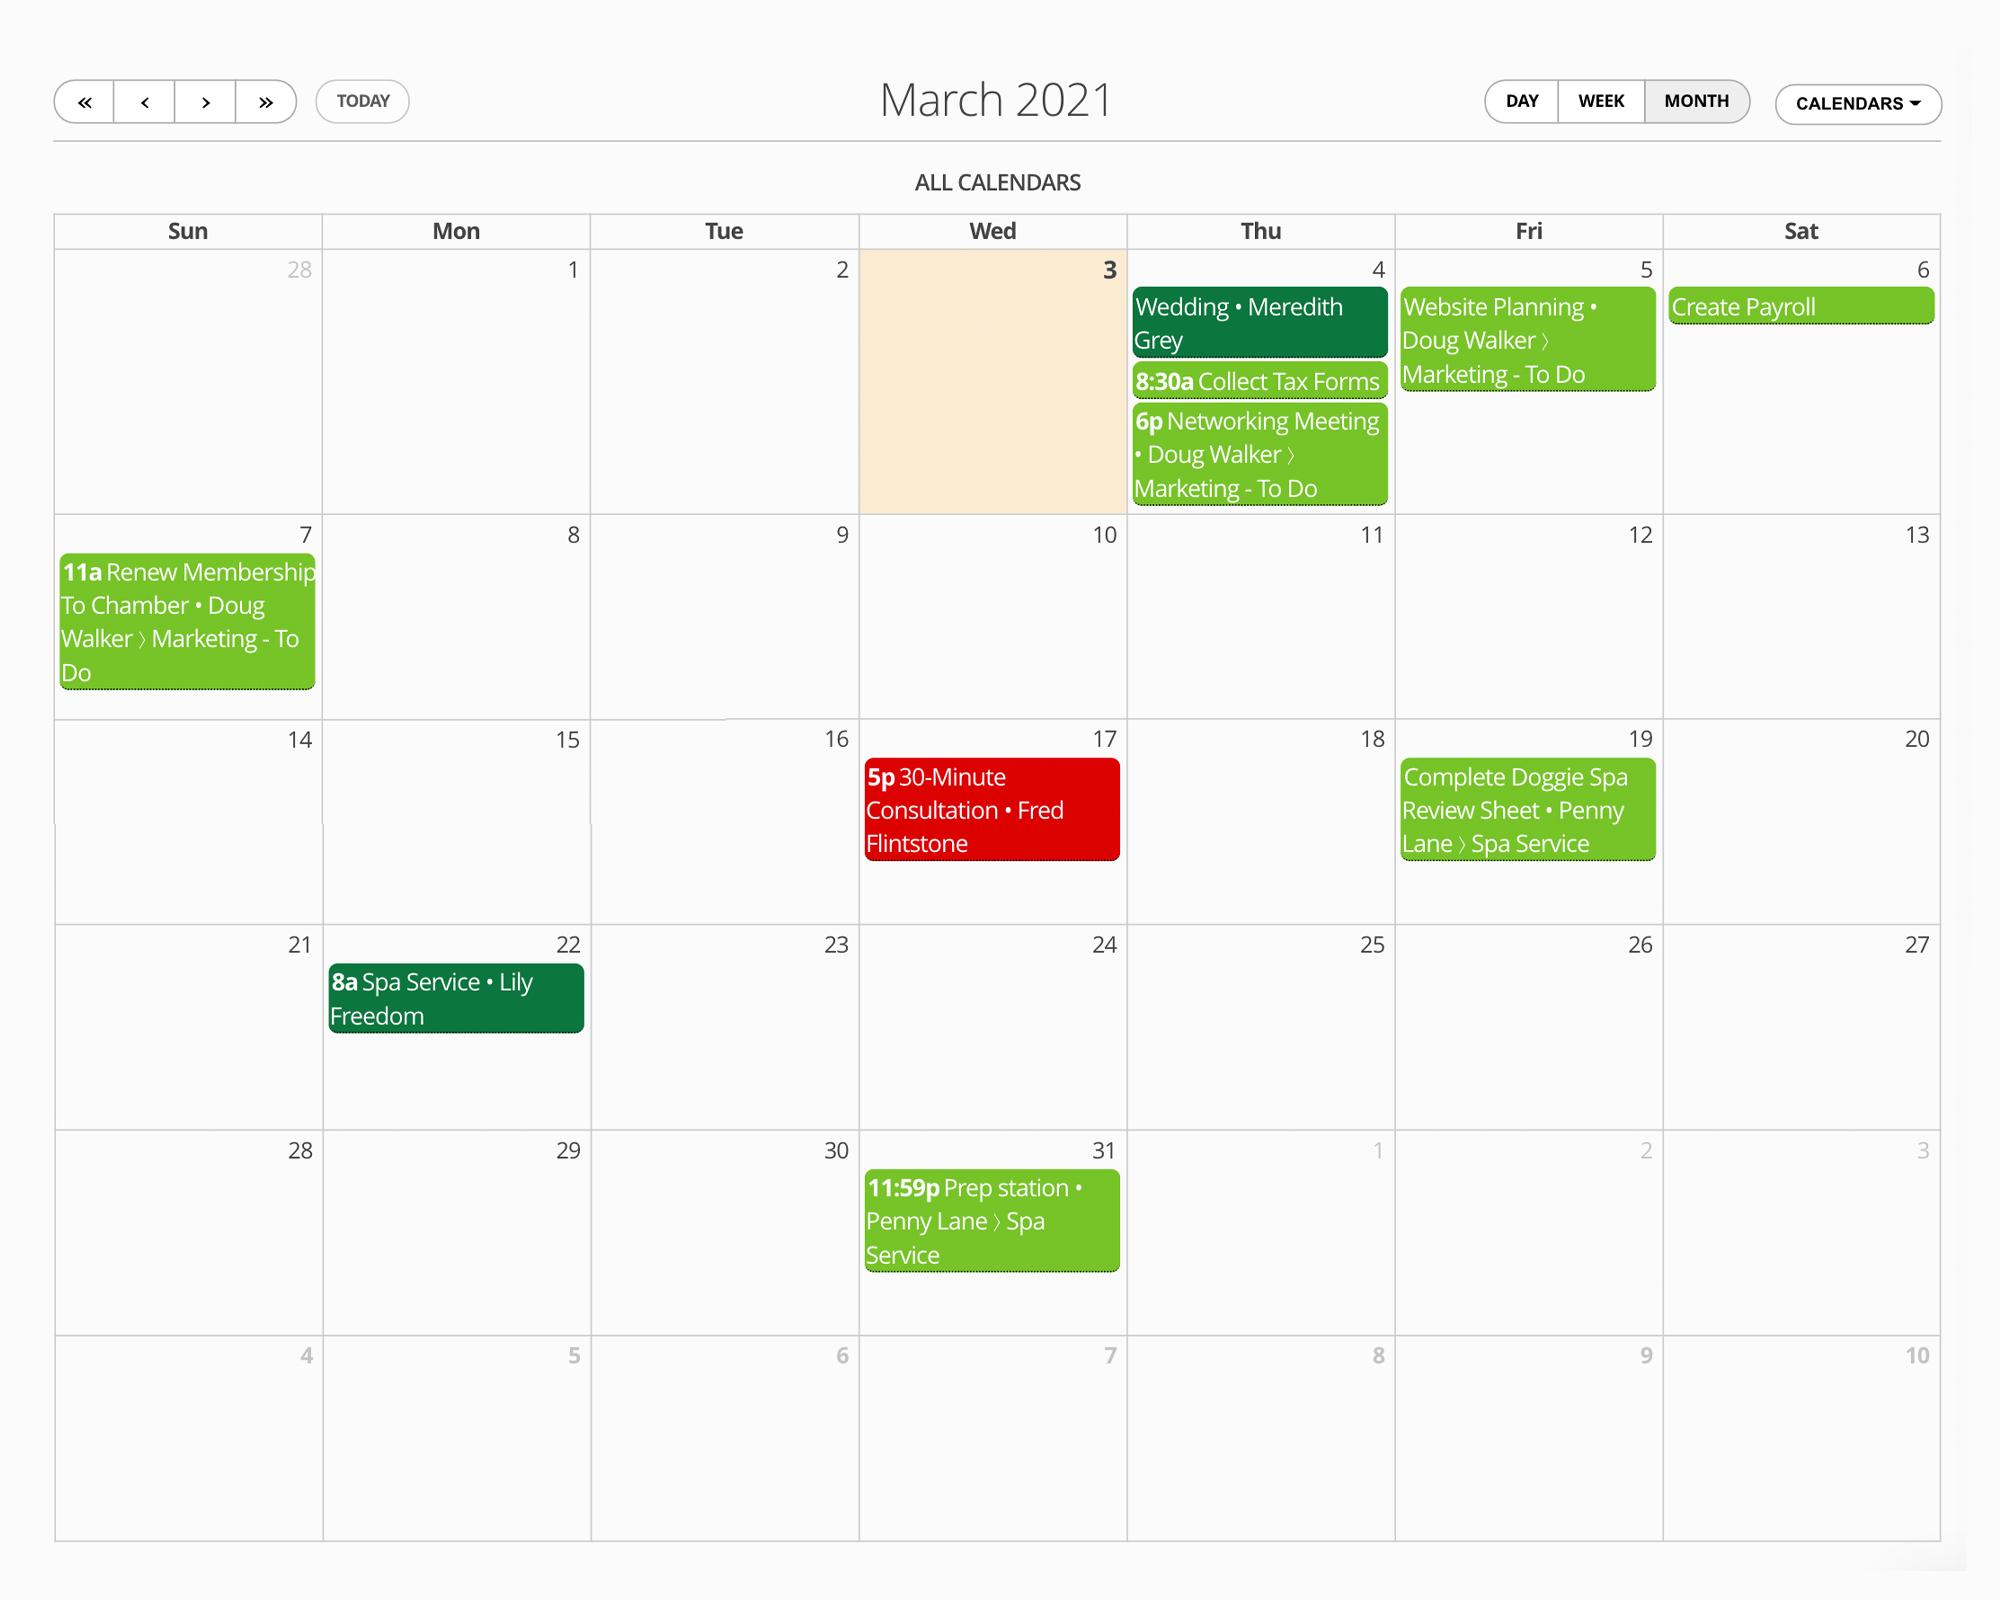 17hats Calendar Organization